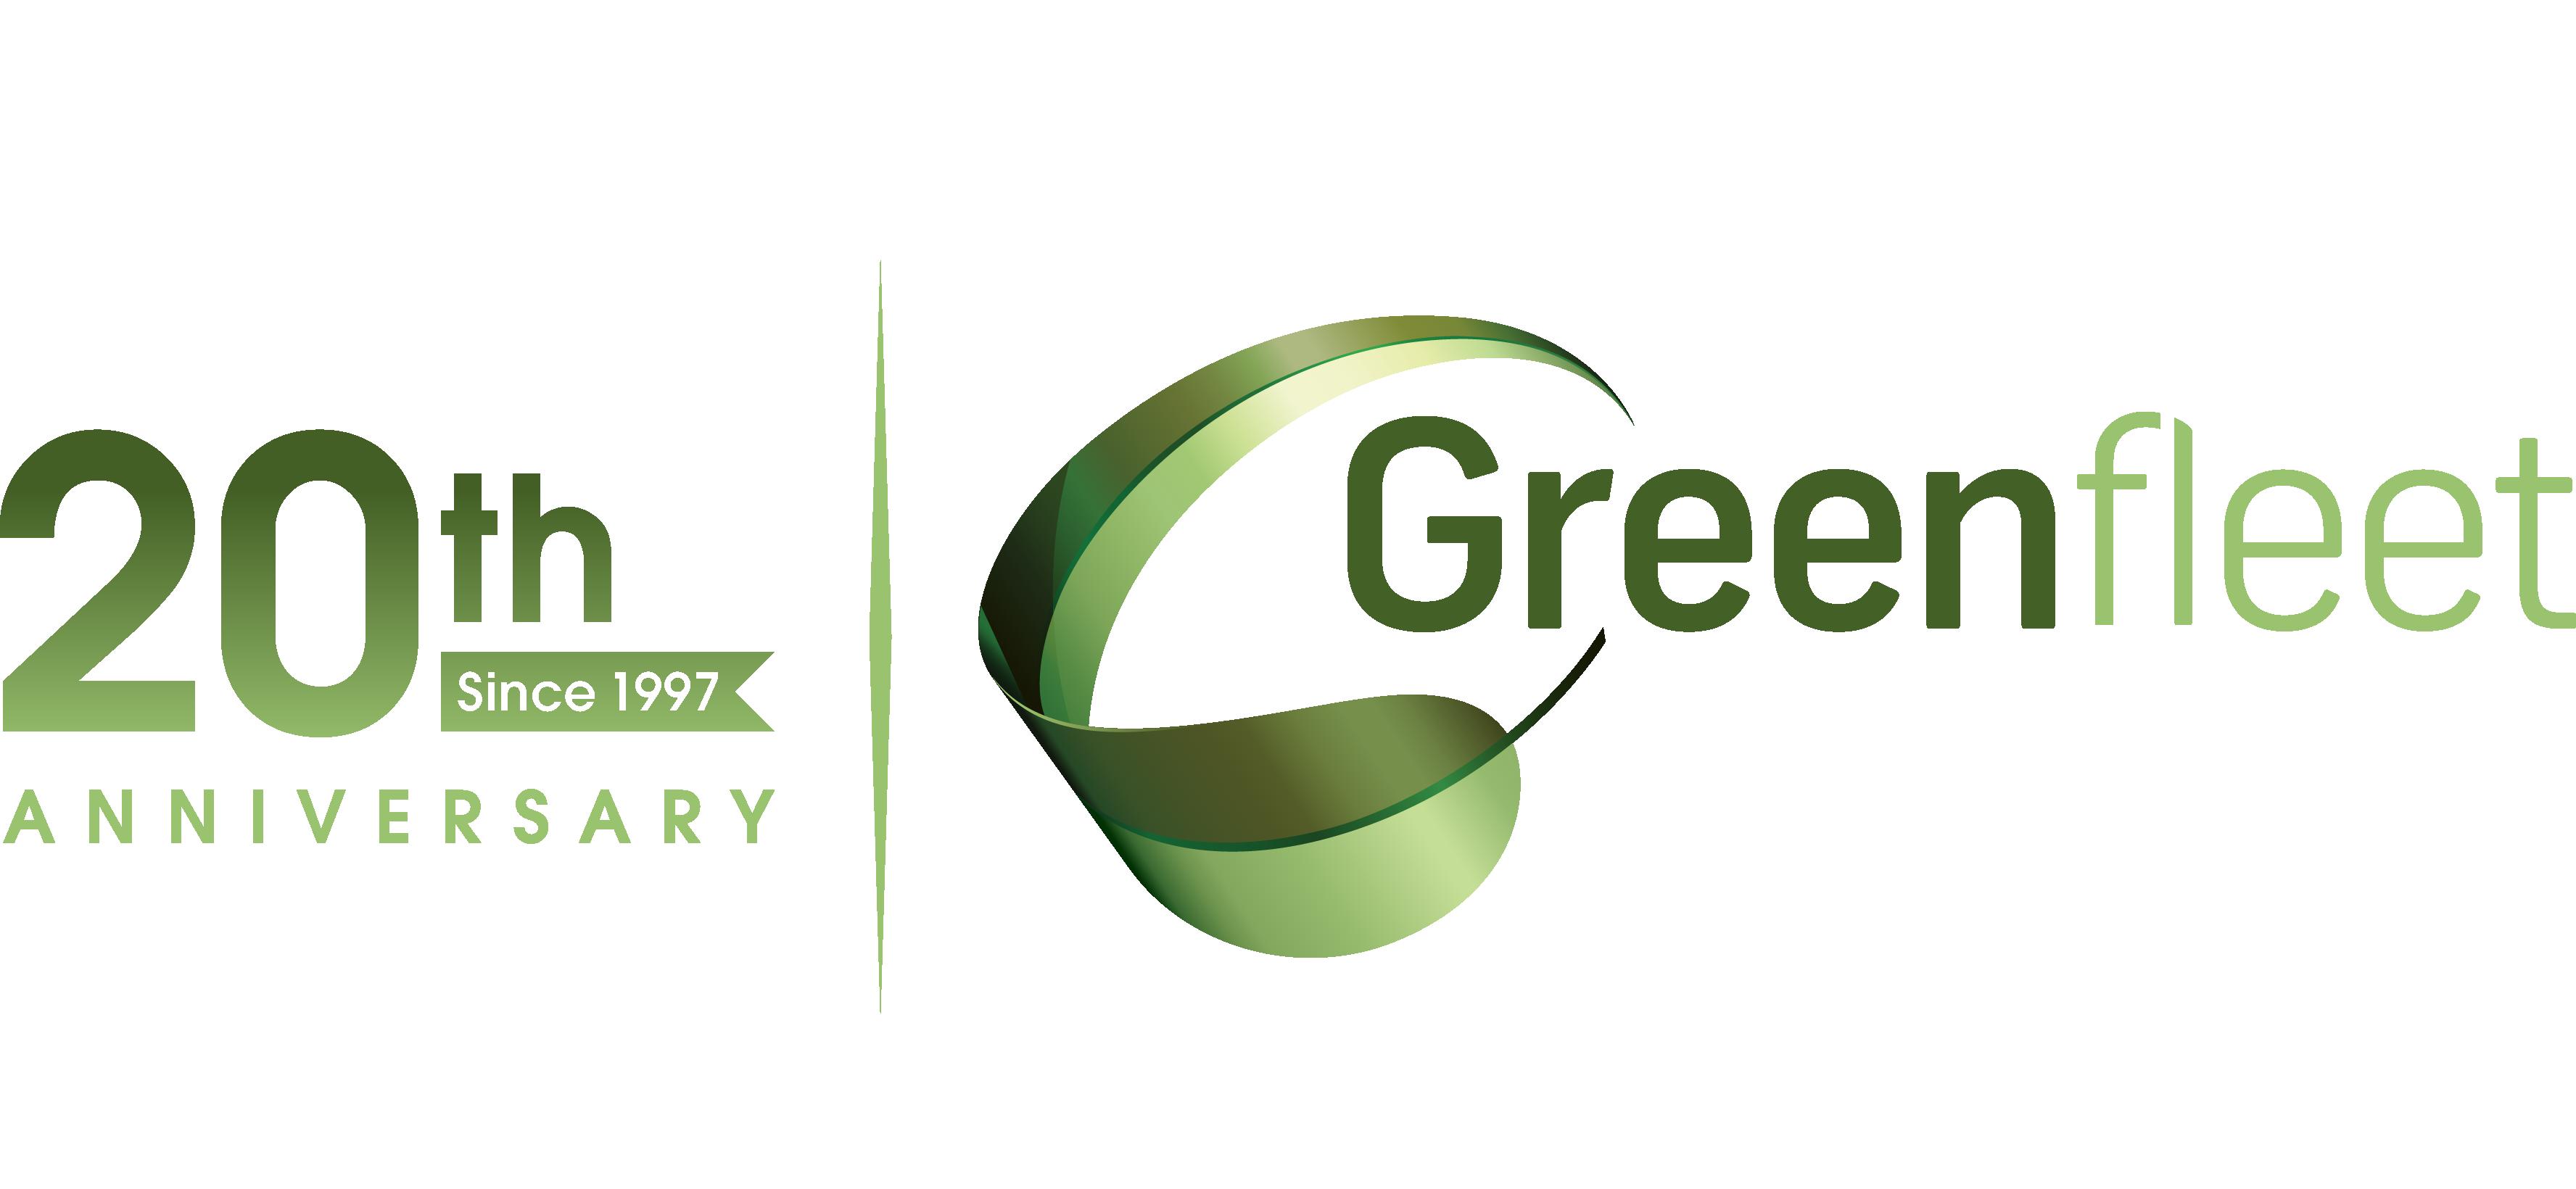 Design a birthday logo for an environmental non-profit turning 20